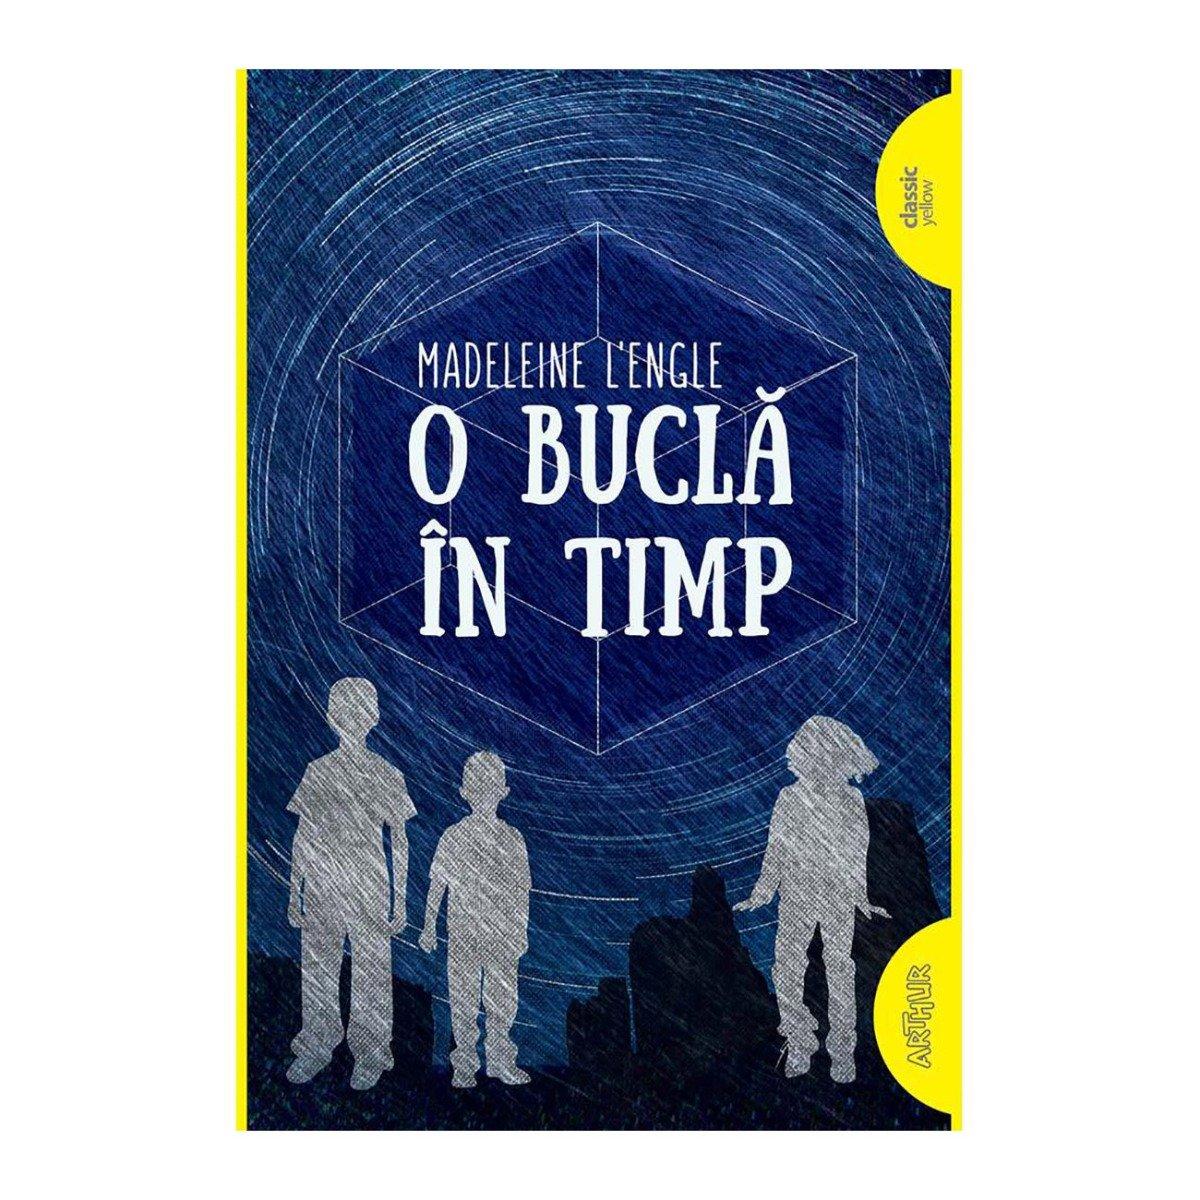 Carte Editura Arthur, O bucla in timp, Madeleine L'Engle